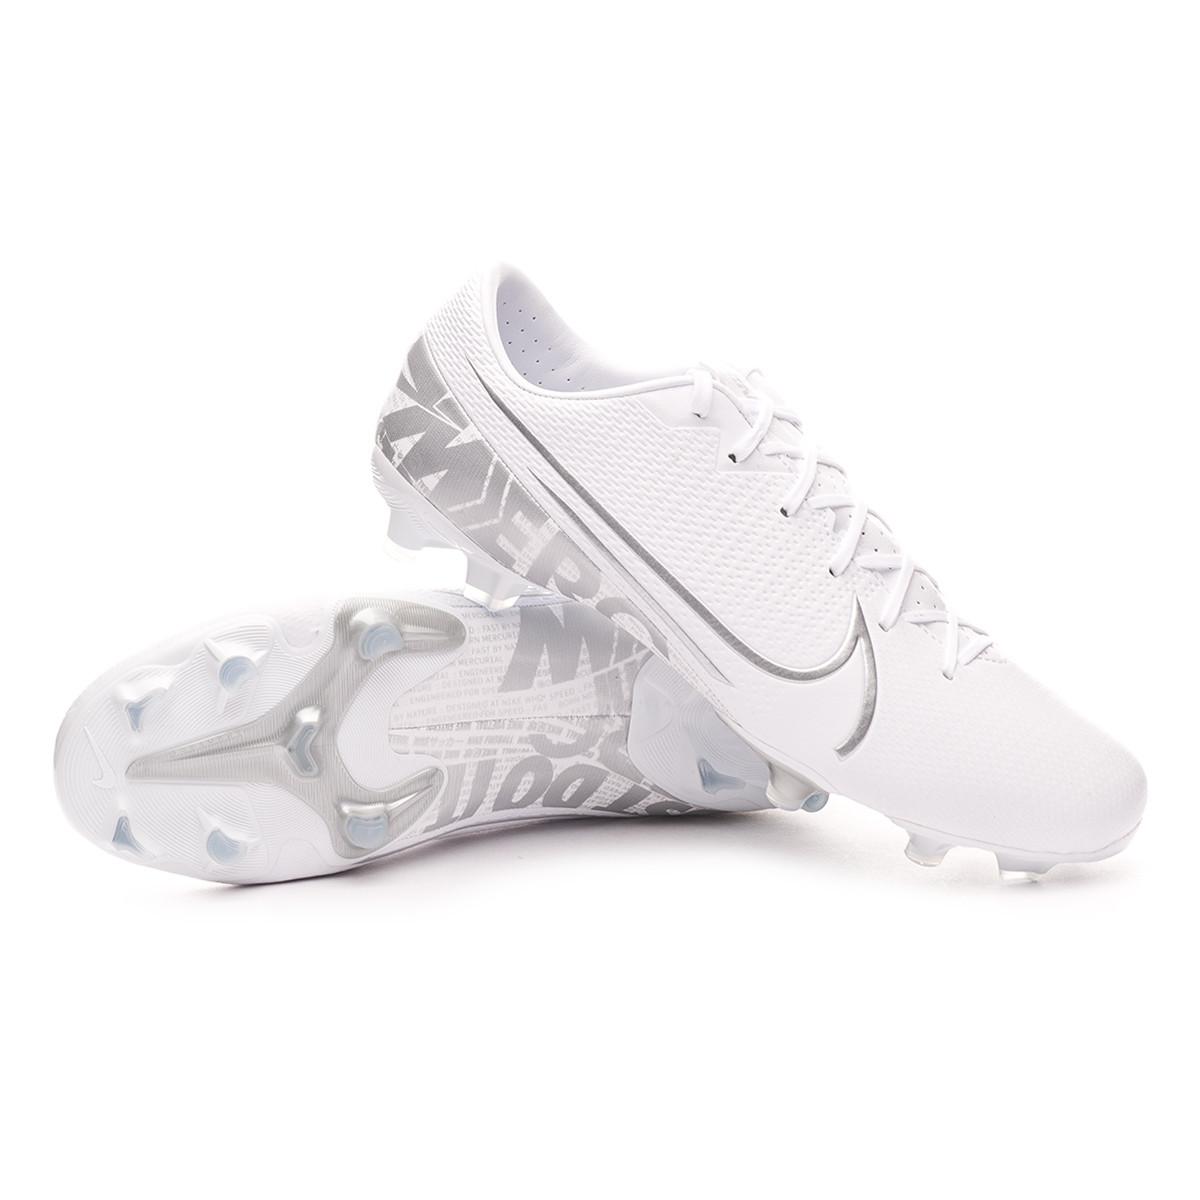 Arrugas Autorizar en el medio de la nada  Football Boots Nike Mercurial Vapor XIII Academy FG/MG  White-Chrome-Metallic silver - Football store Fútbol Emotion